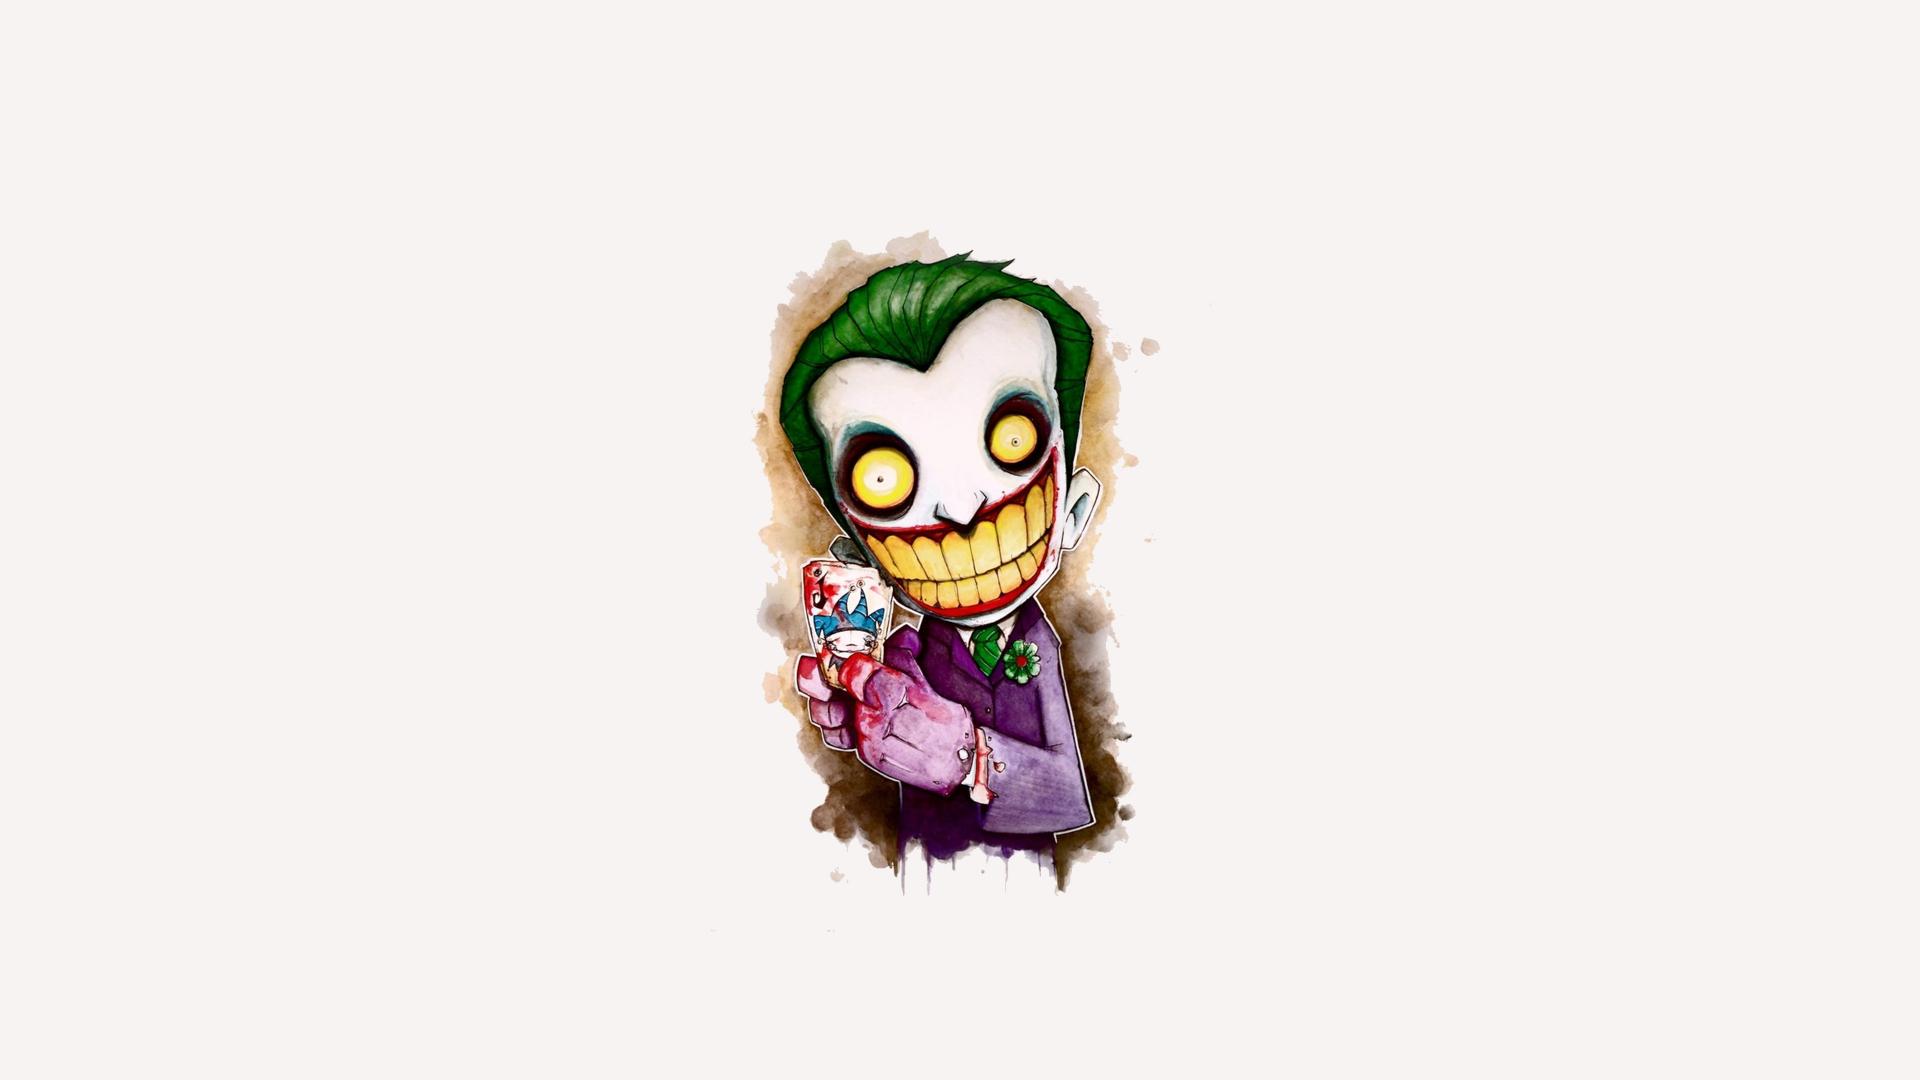 Download 1920x1080 Wallpaper Joker Cartoon Artwork 4k